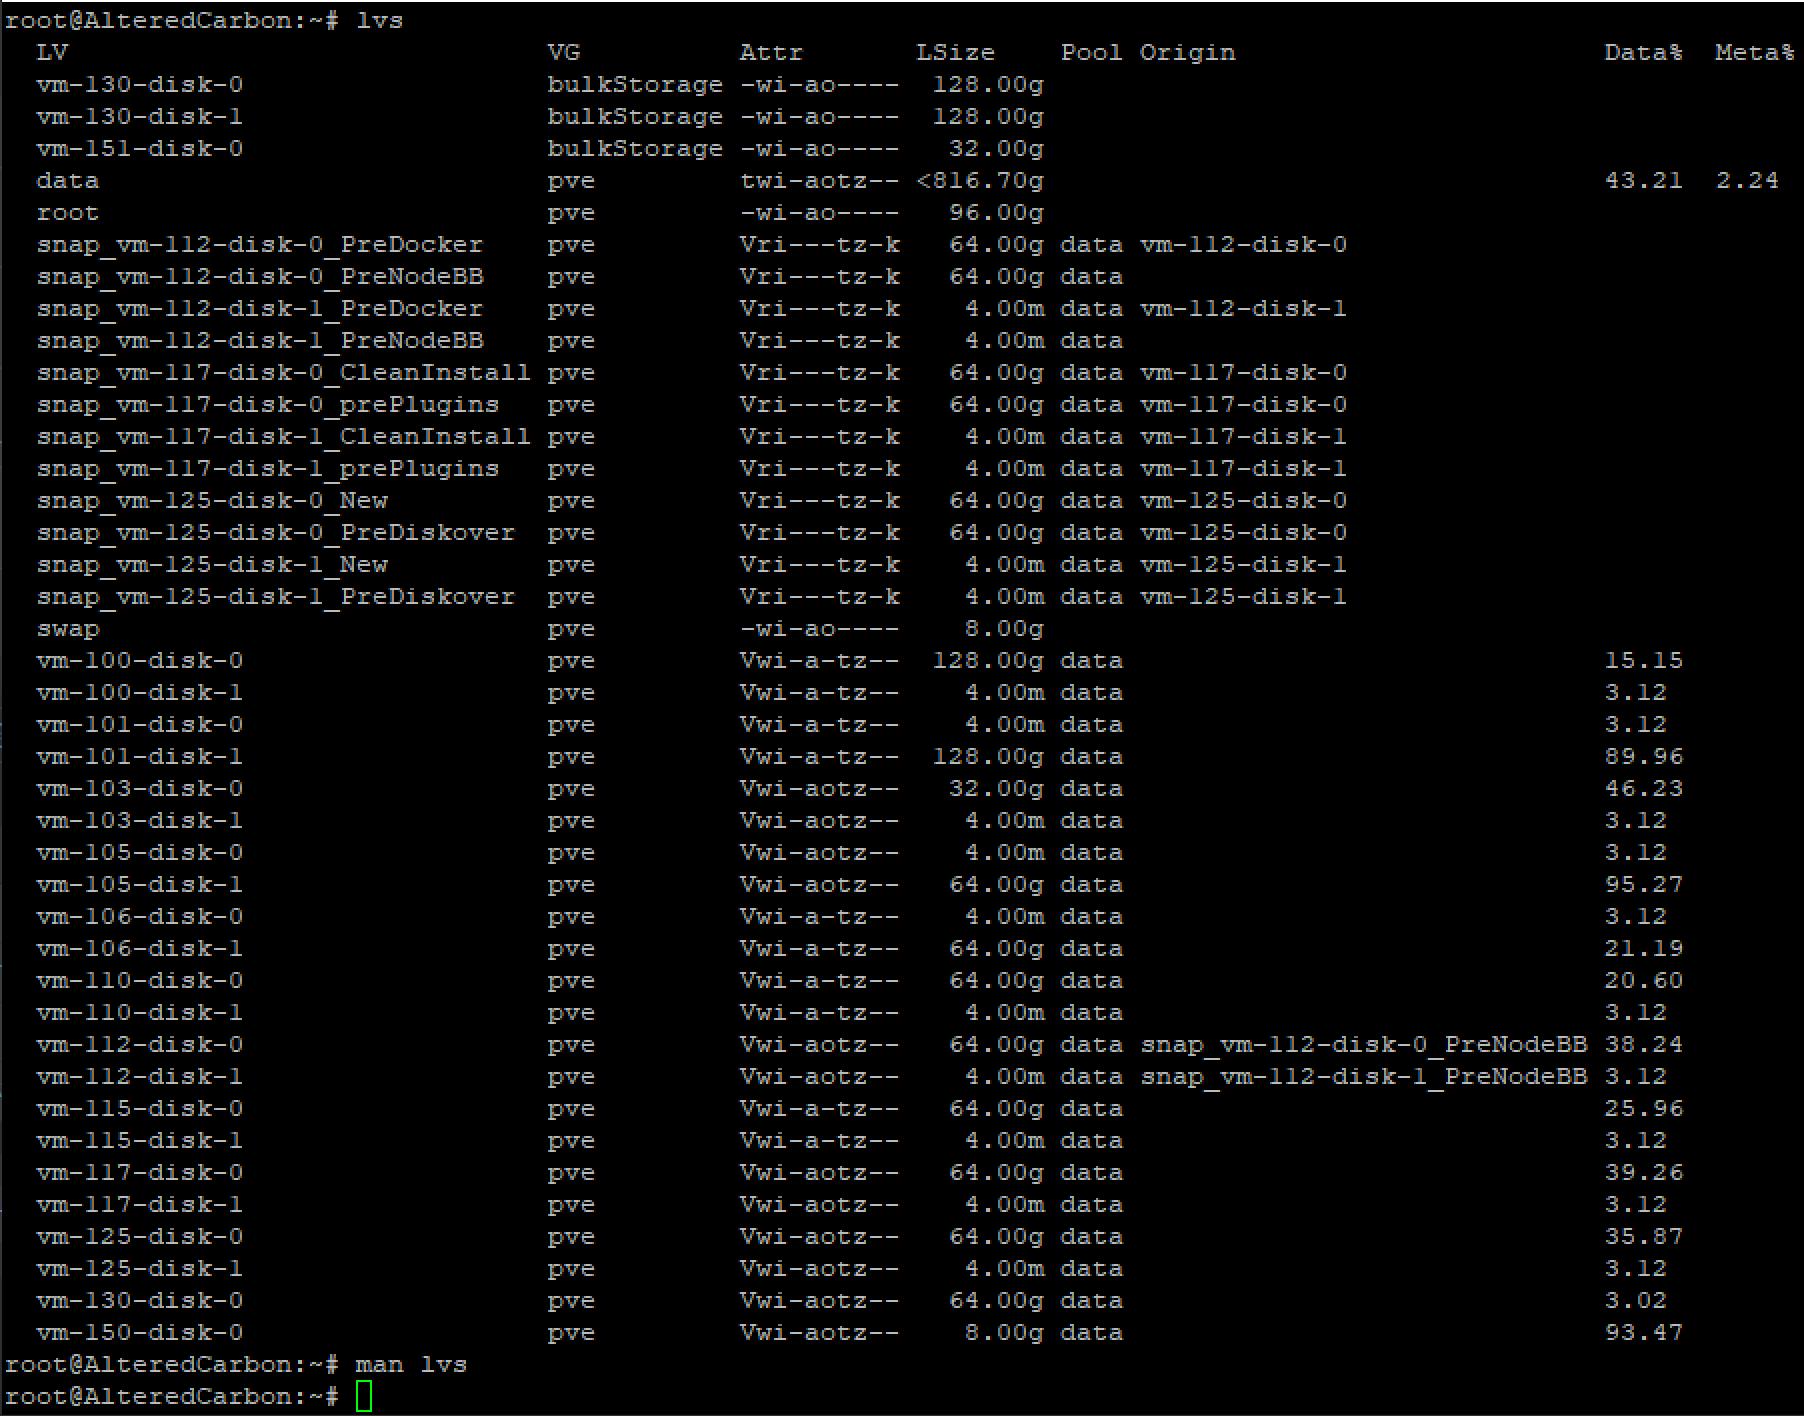 Investigating storage utilization with lvs command